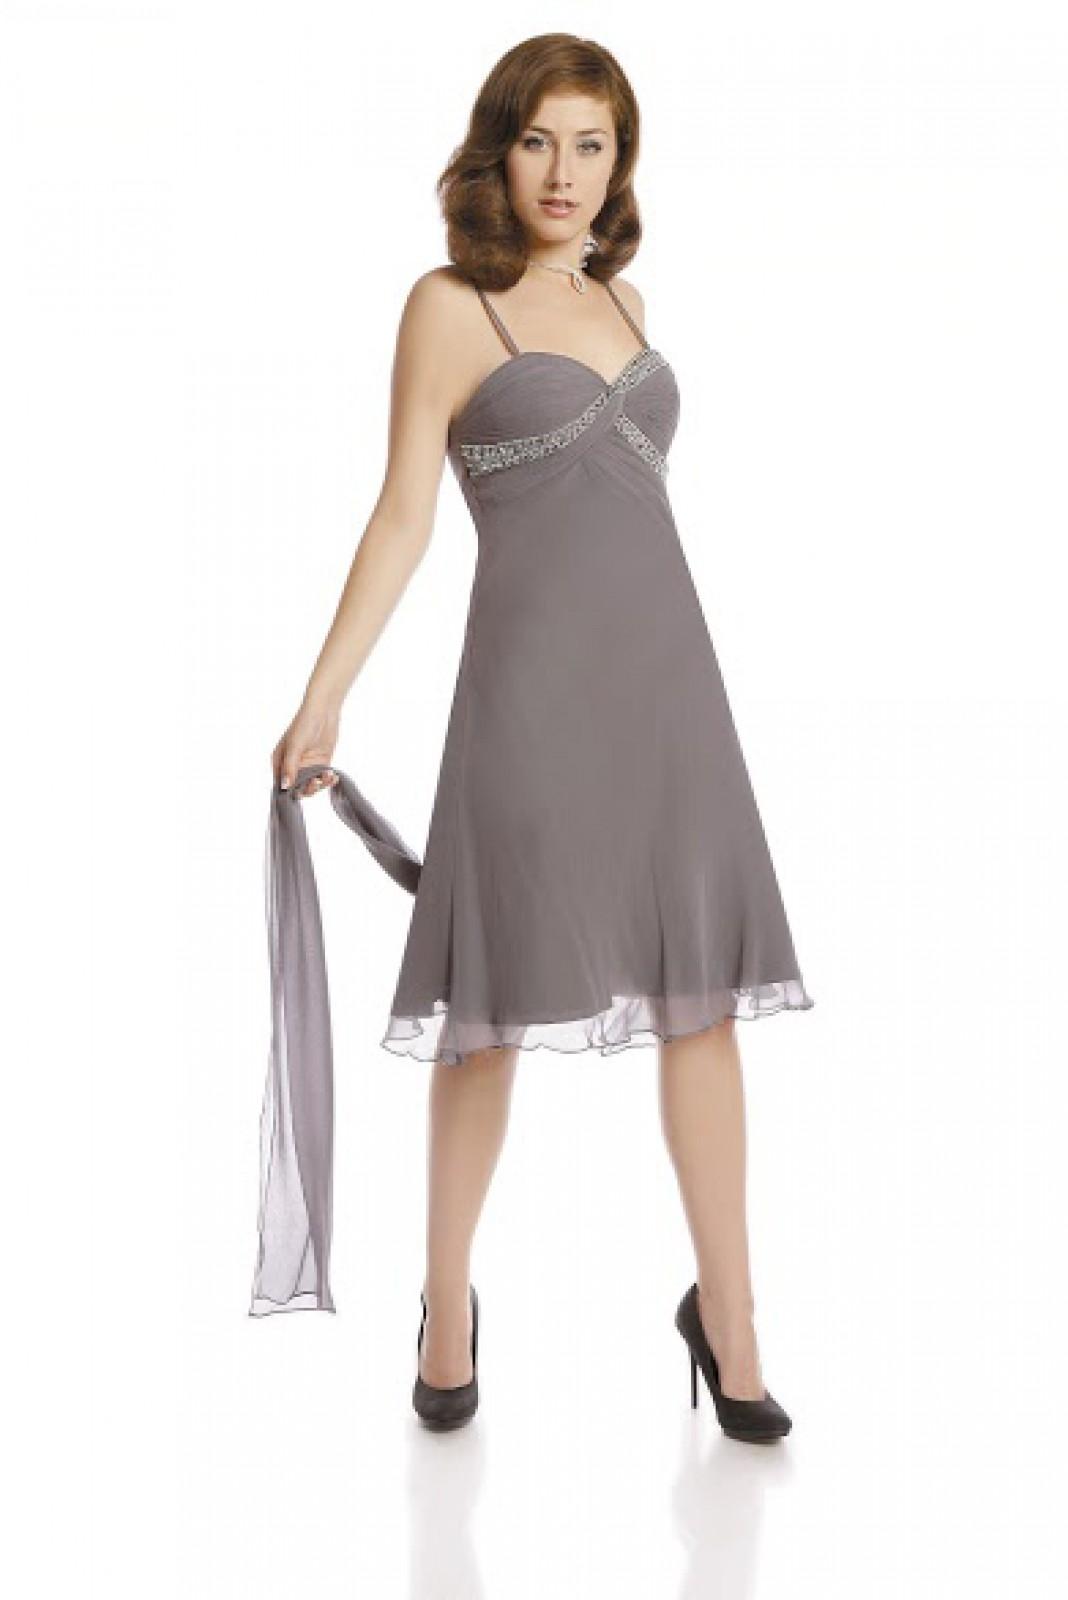 Großzügig Seide Partykleid Fotos - Brautkleider Ideen - cashingy.info